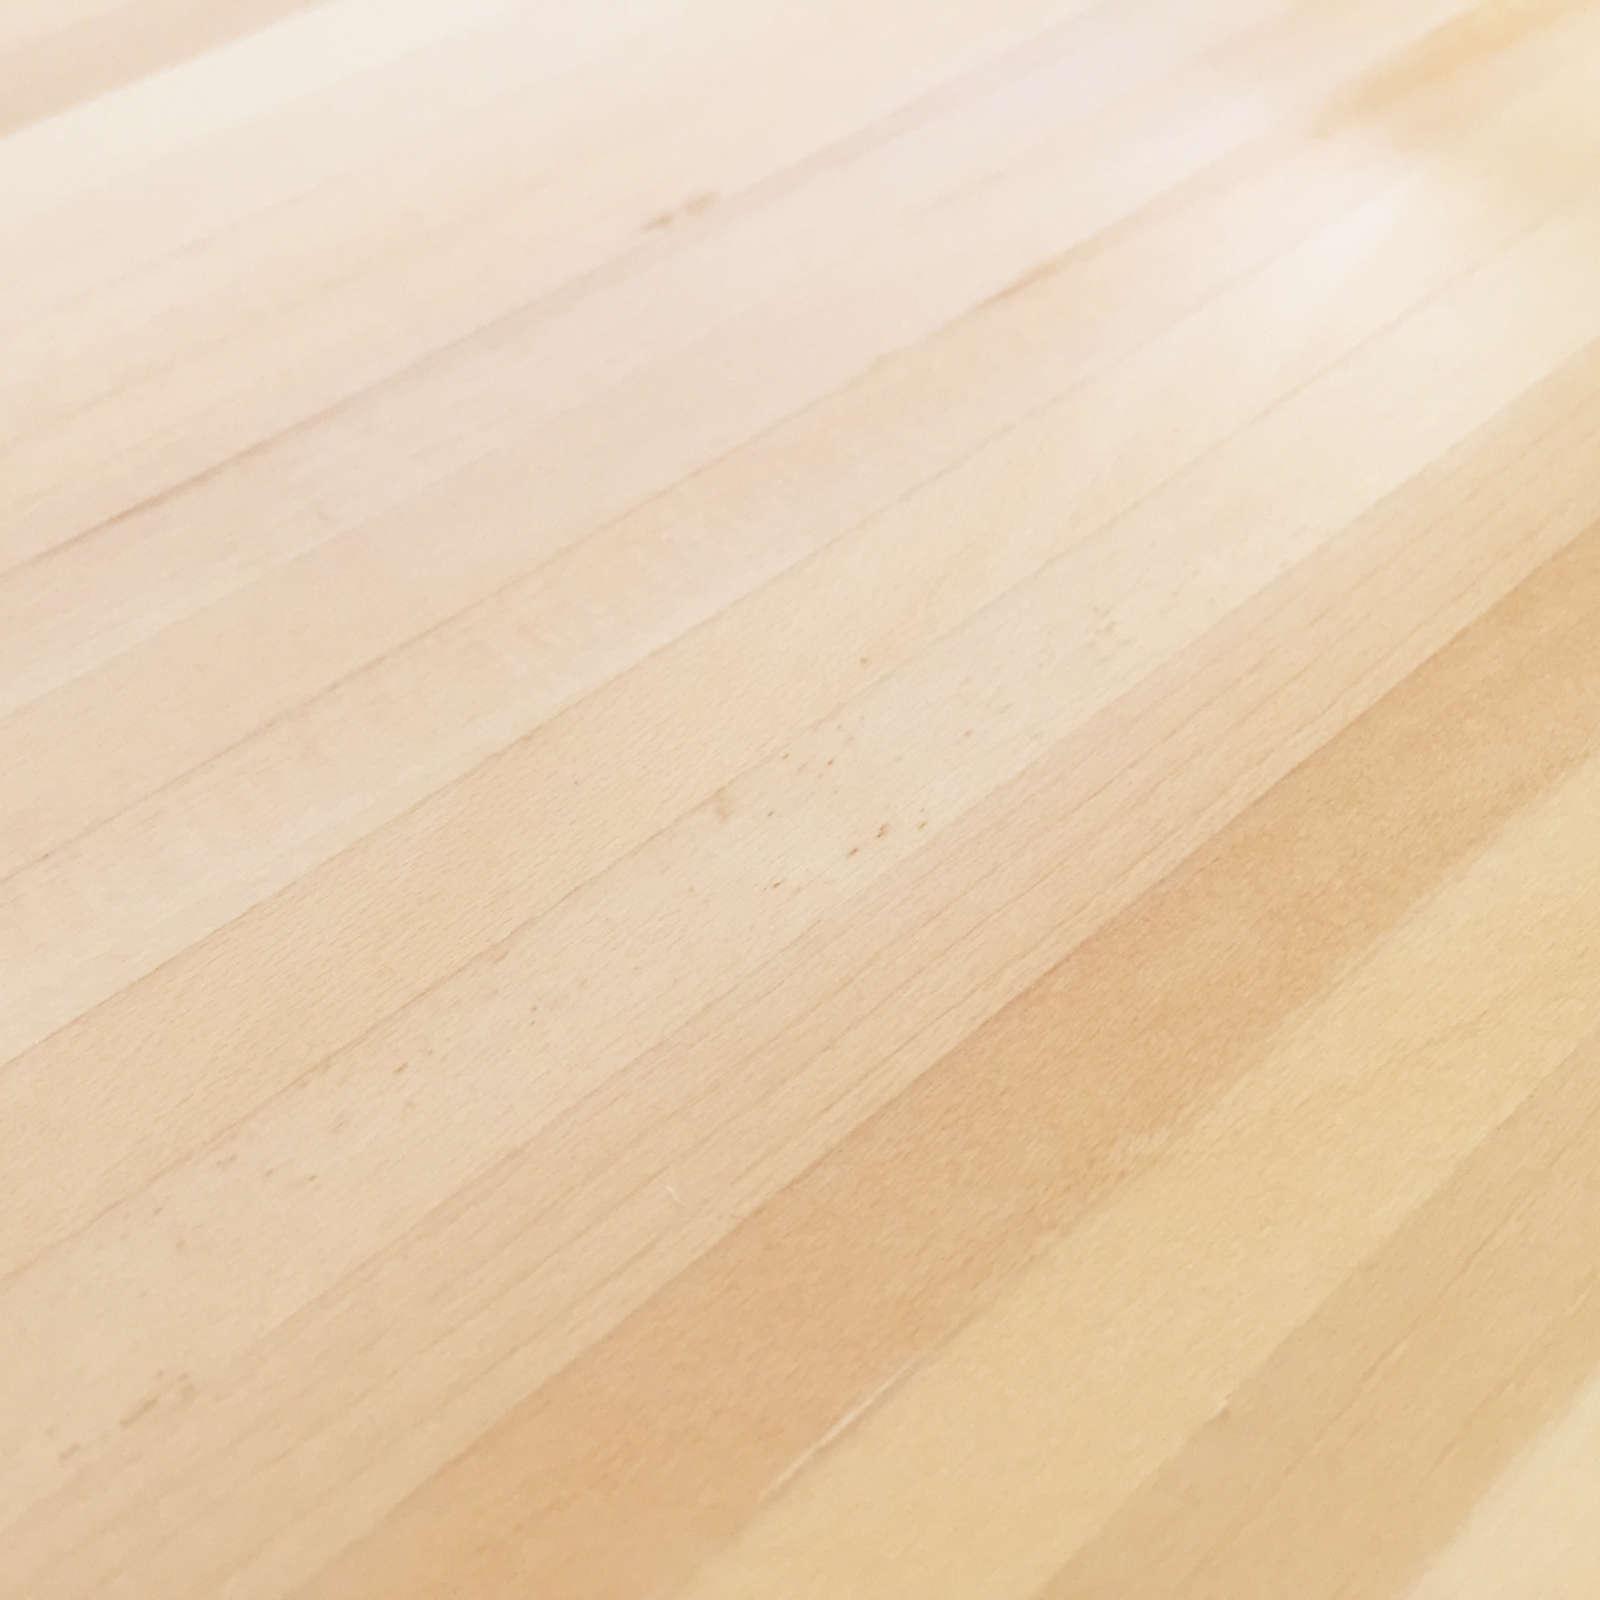 Dollhouse Rosewood Narrow Splicing Wood Floor Miniature DIY Accessories